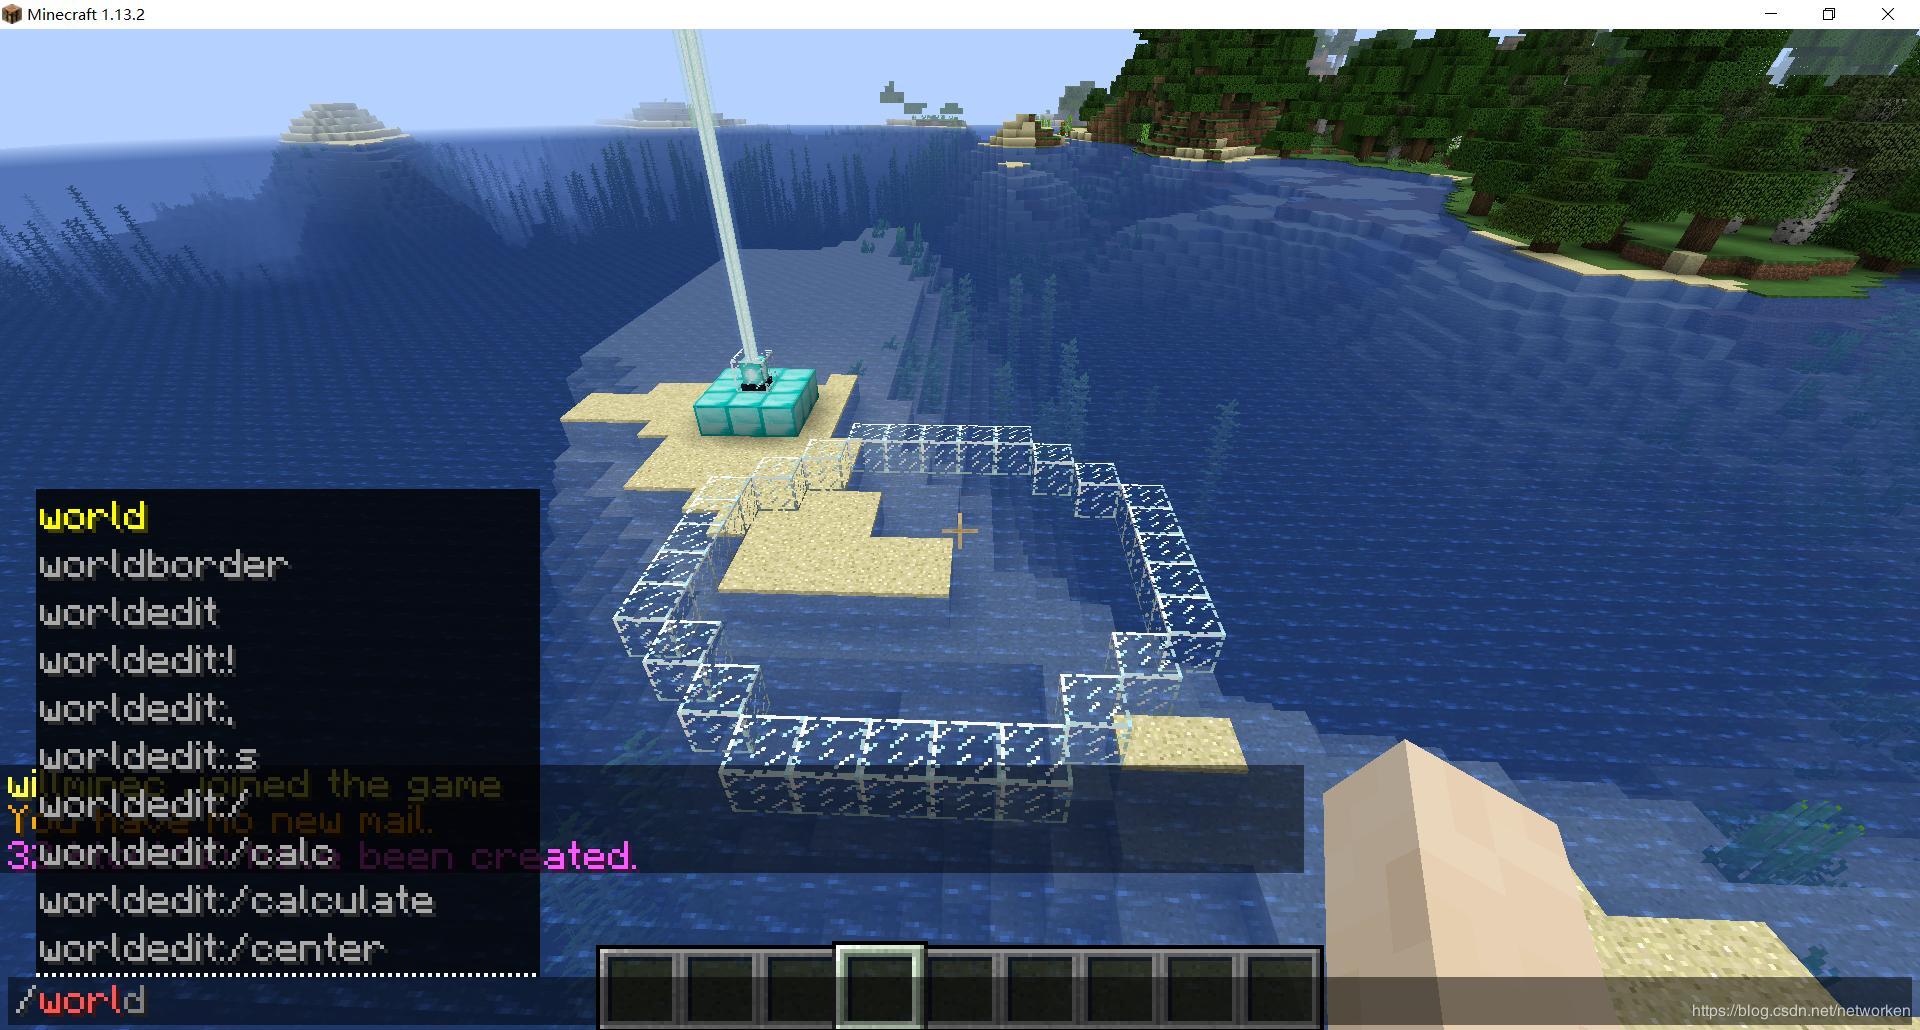 Docker builds Minecraft server - Programmer Sought